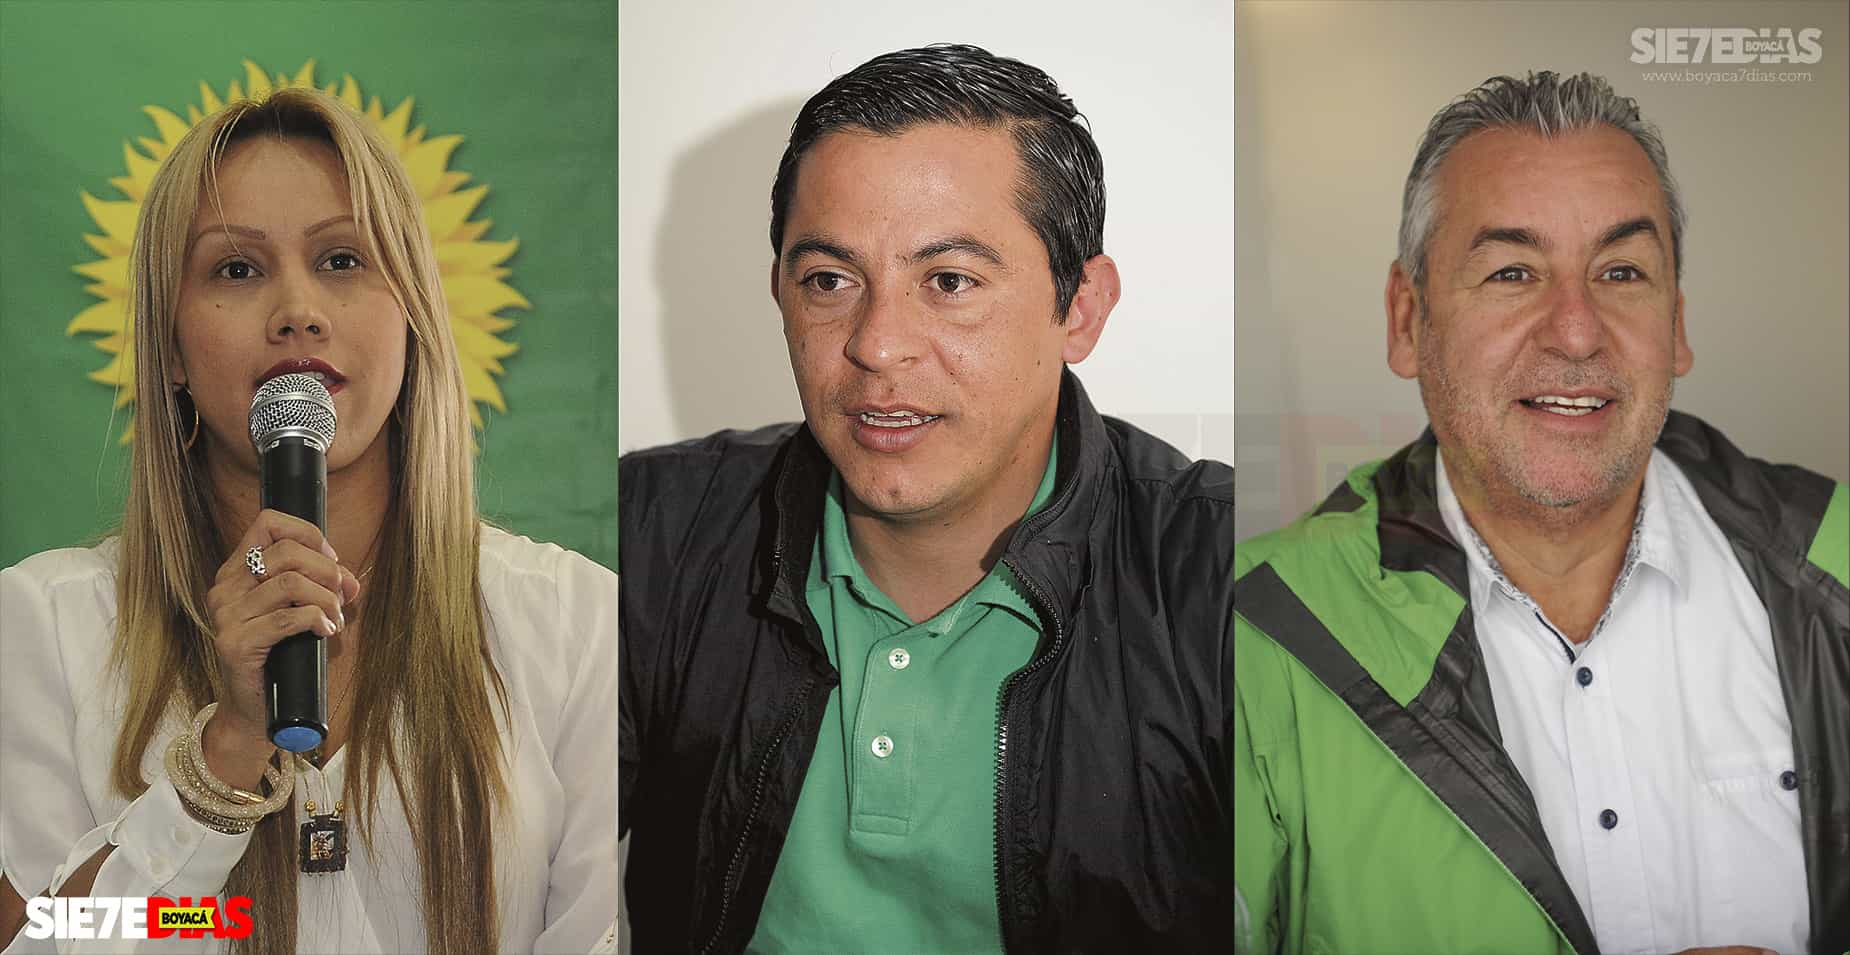 Sandra Ortiz, Wilmer Leal Abril y Jorge Eduardo Londoño. Fotos: archivo Boyacá Siete Días.